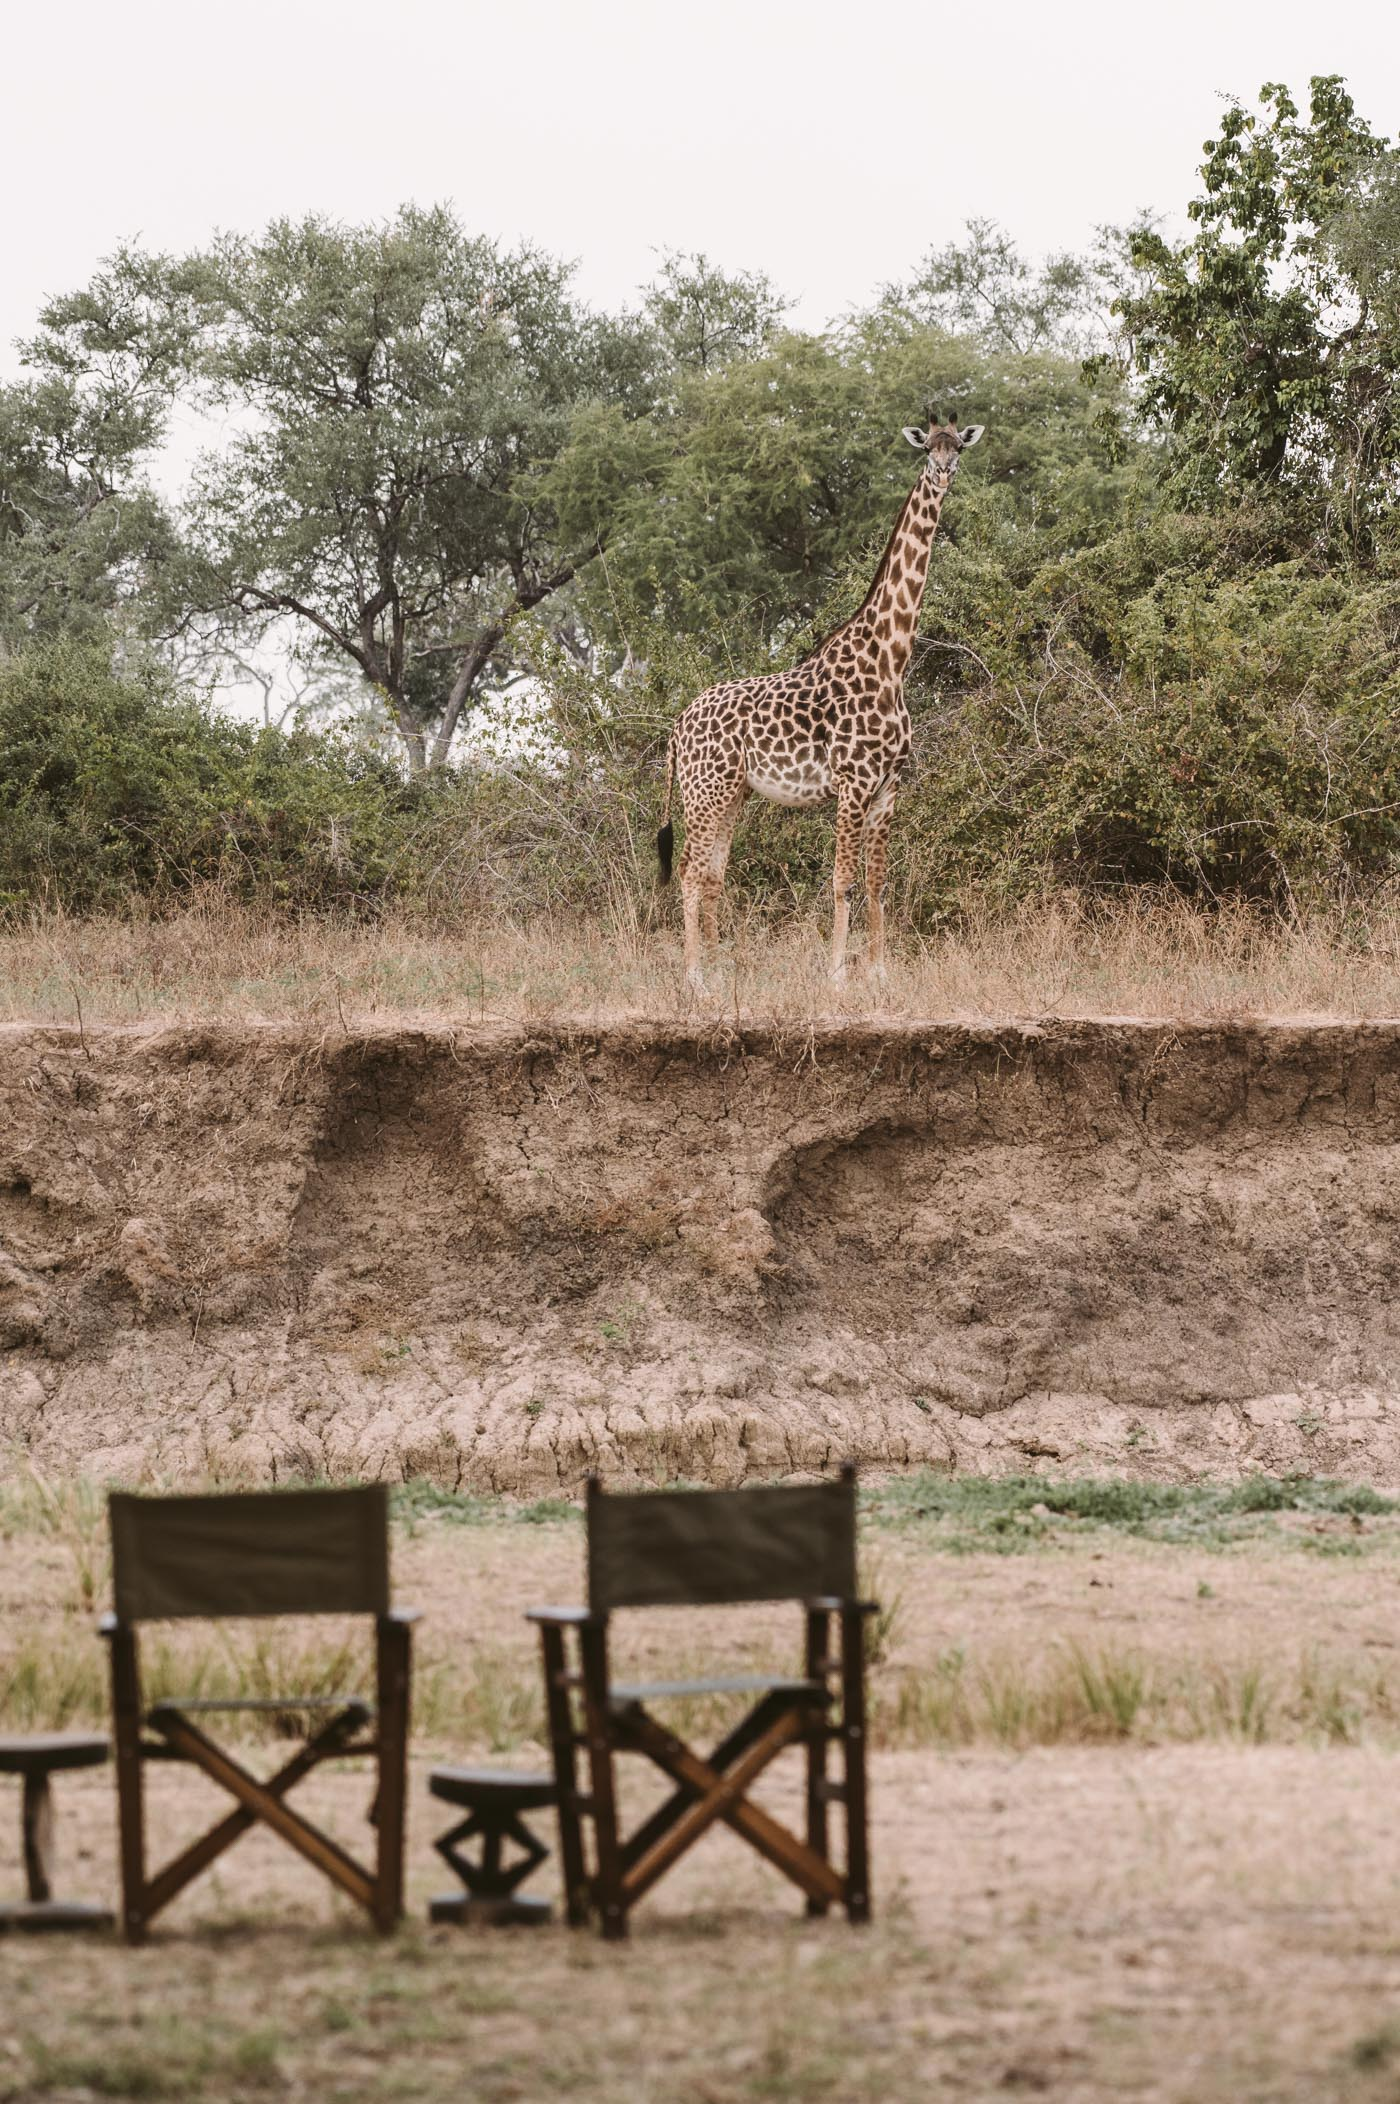 Mwamba camp by Shenton Safaris in South Luangwa National Park Zambia